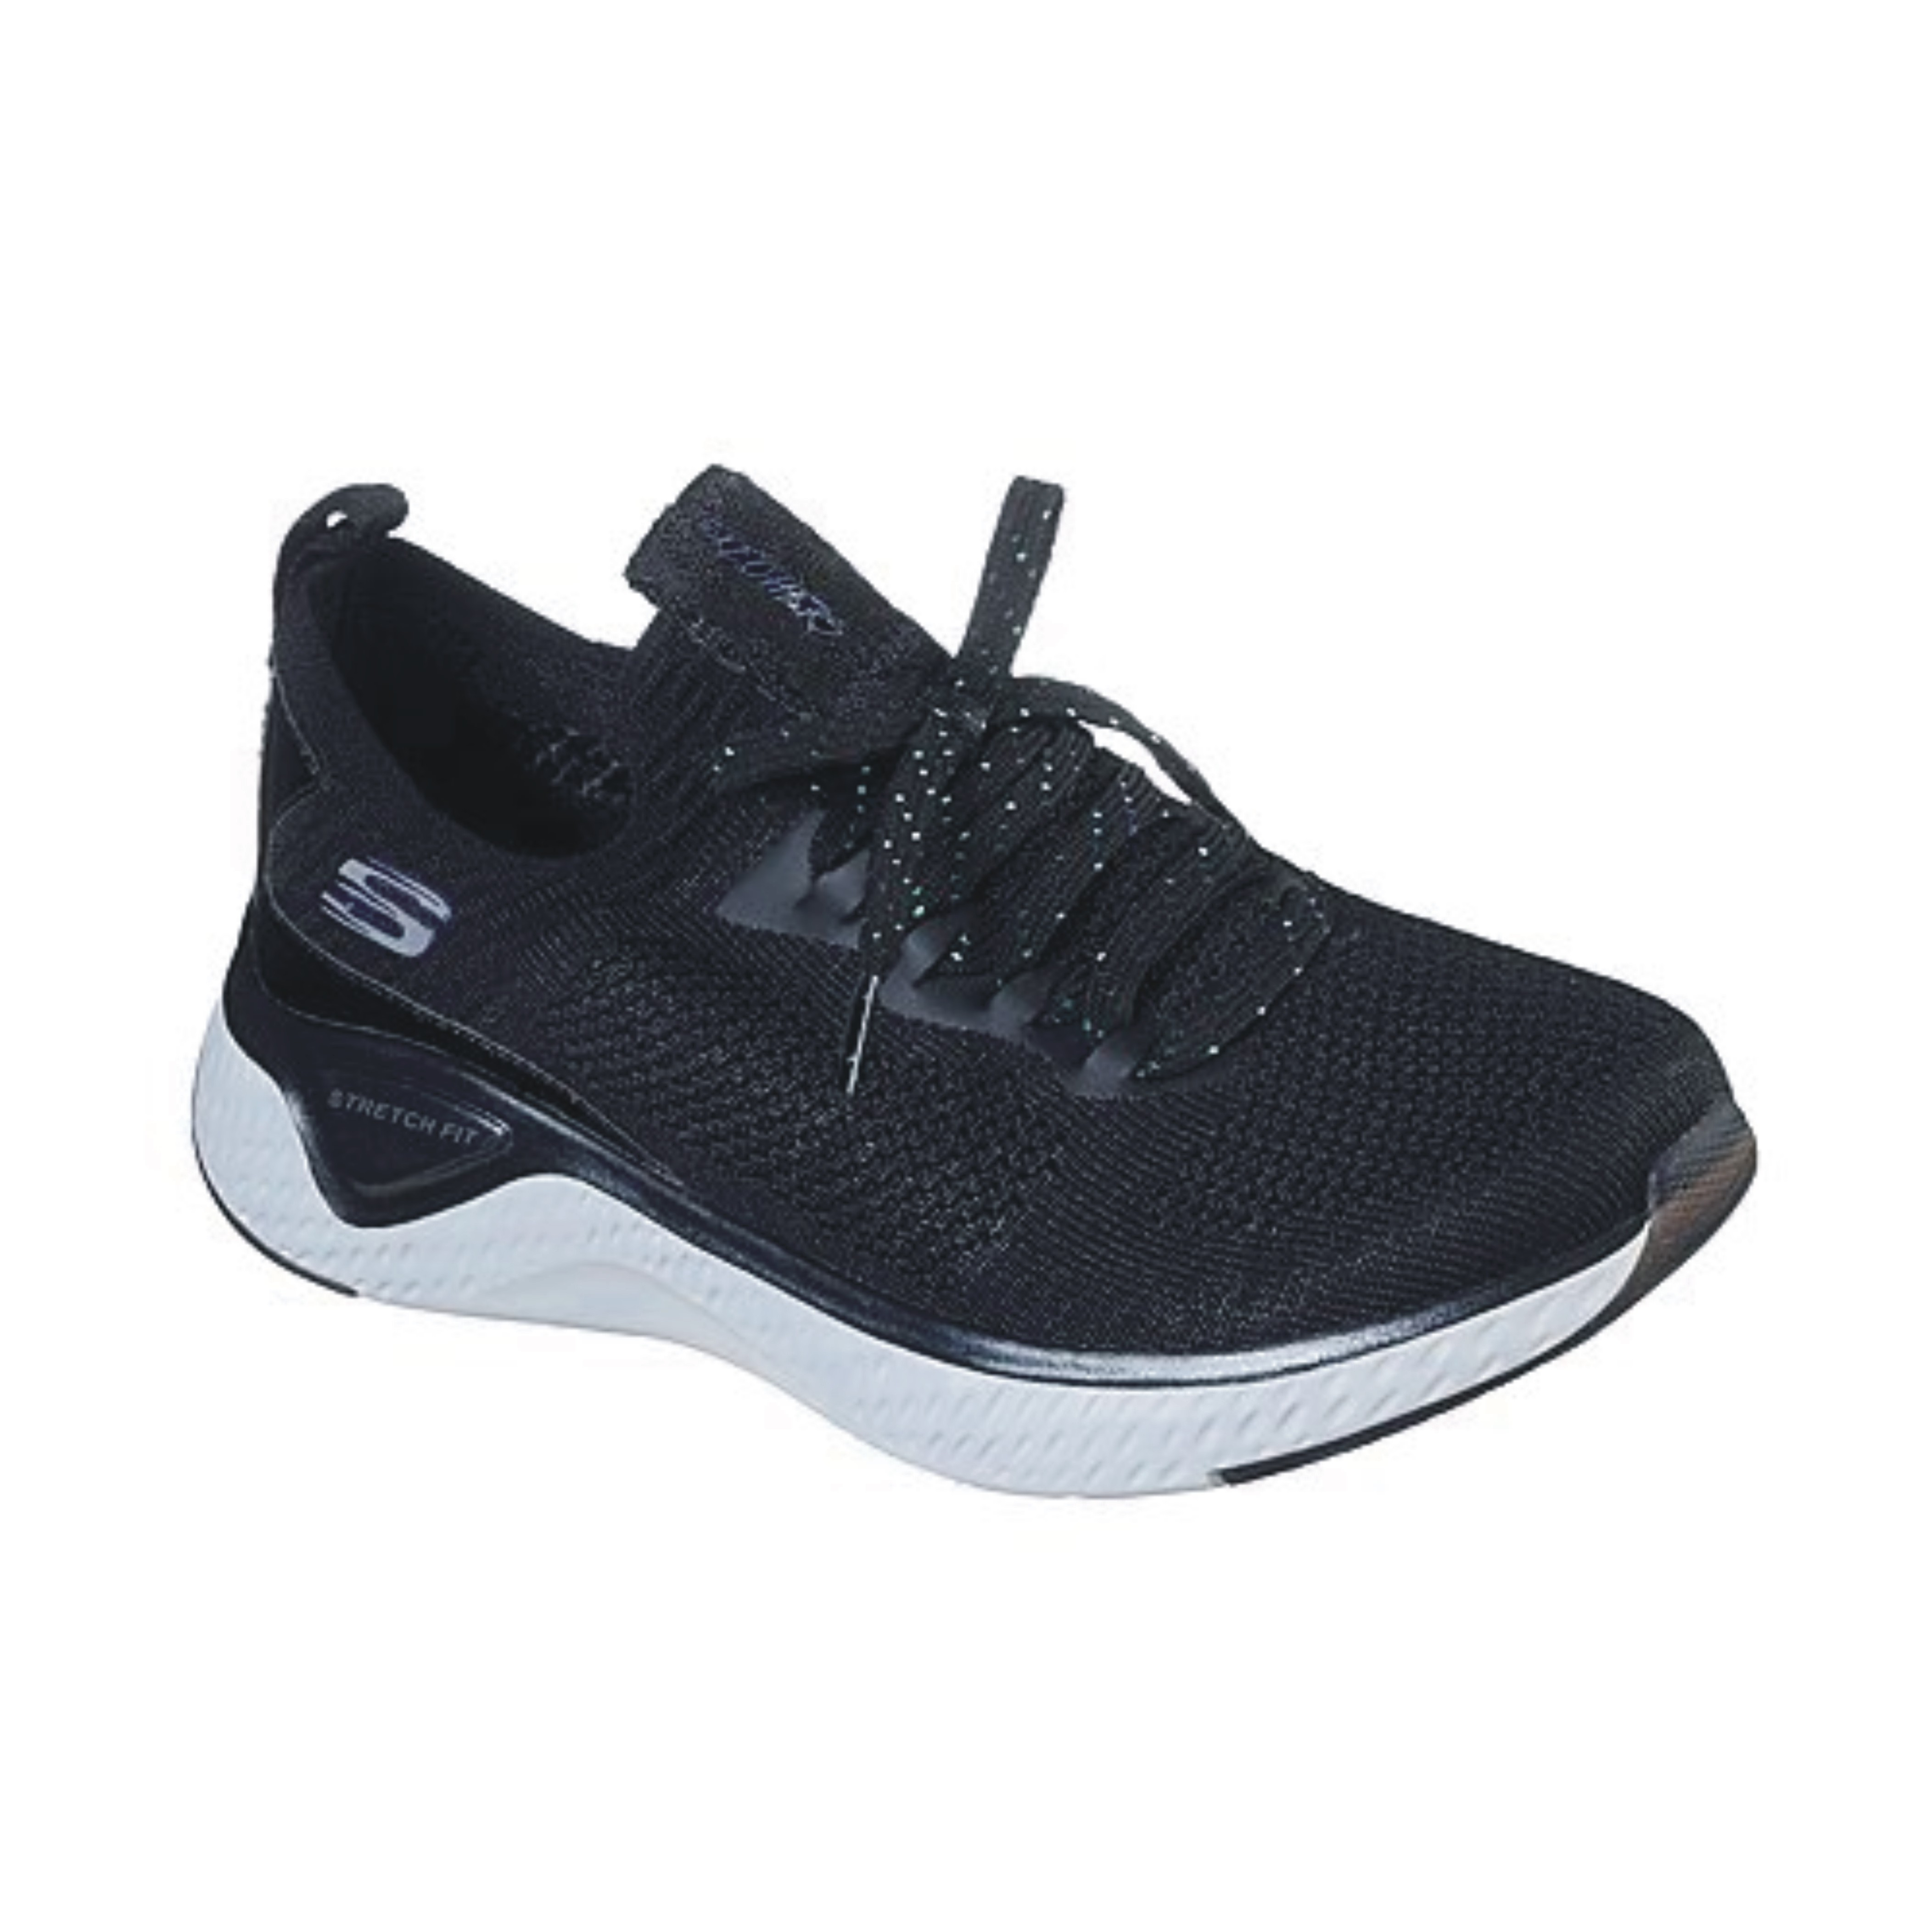 Sneaker Donna Solar Fuse Gravity Experience 149025.BLK